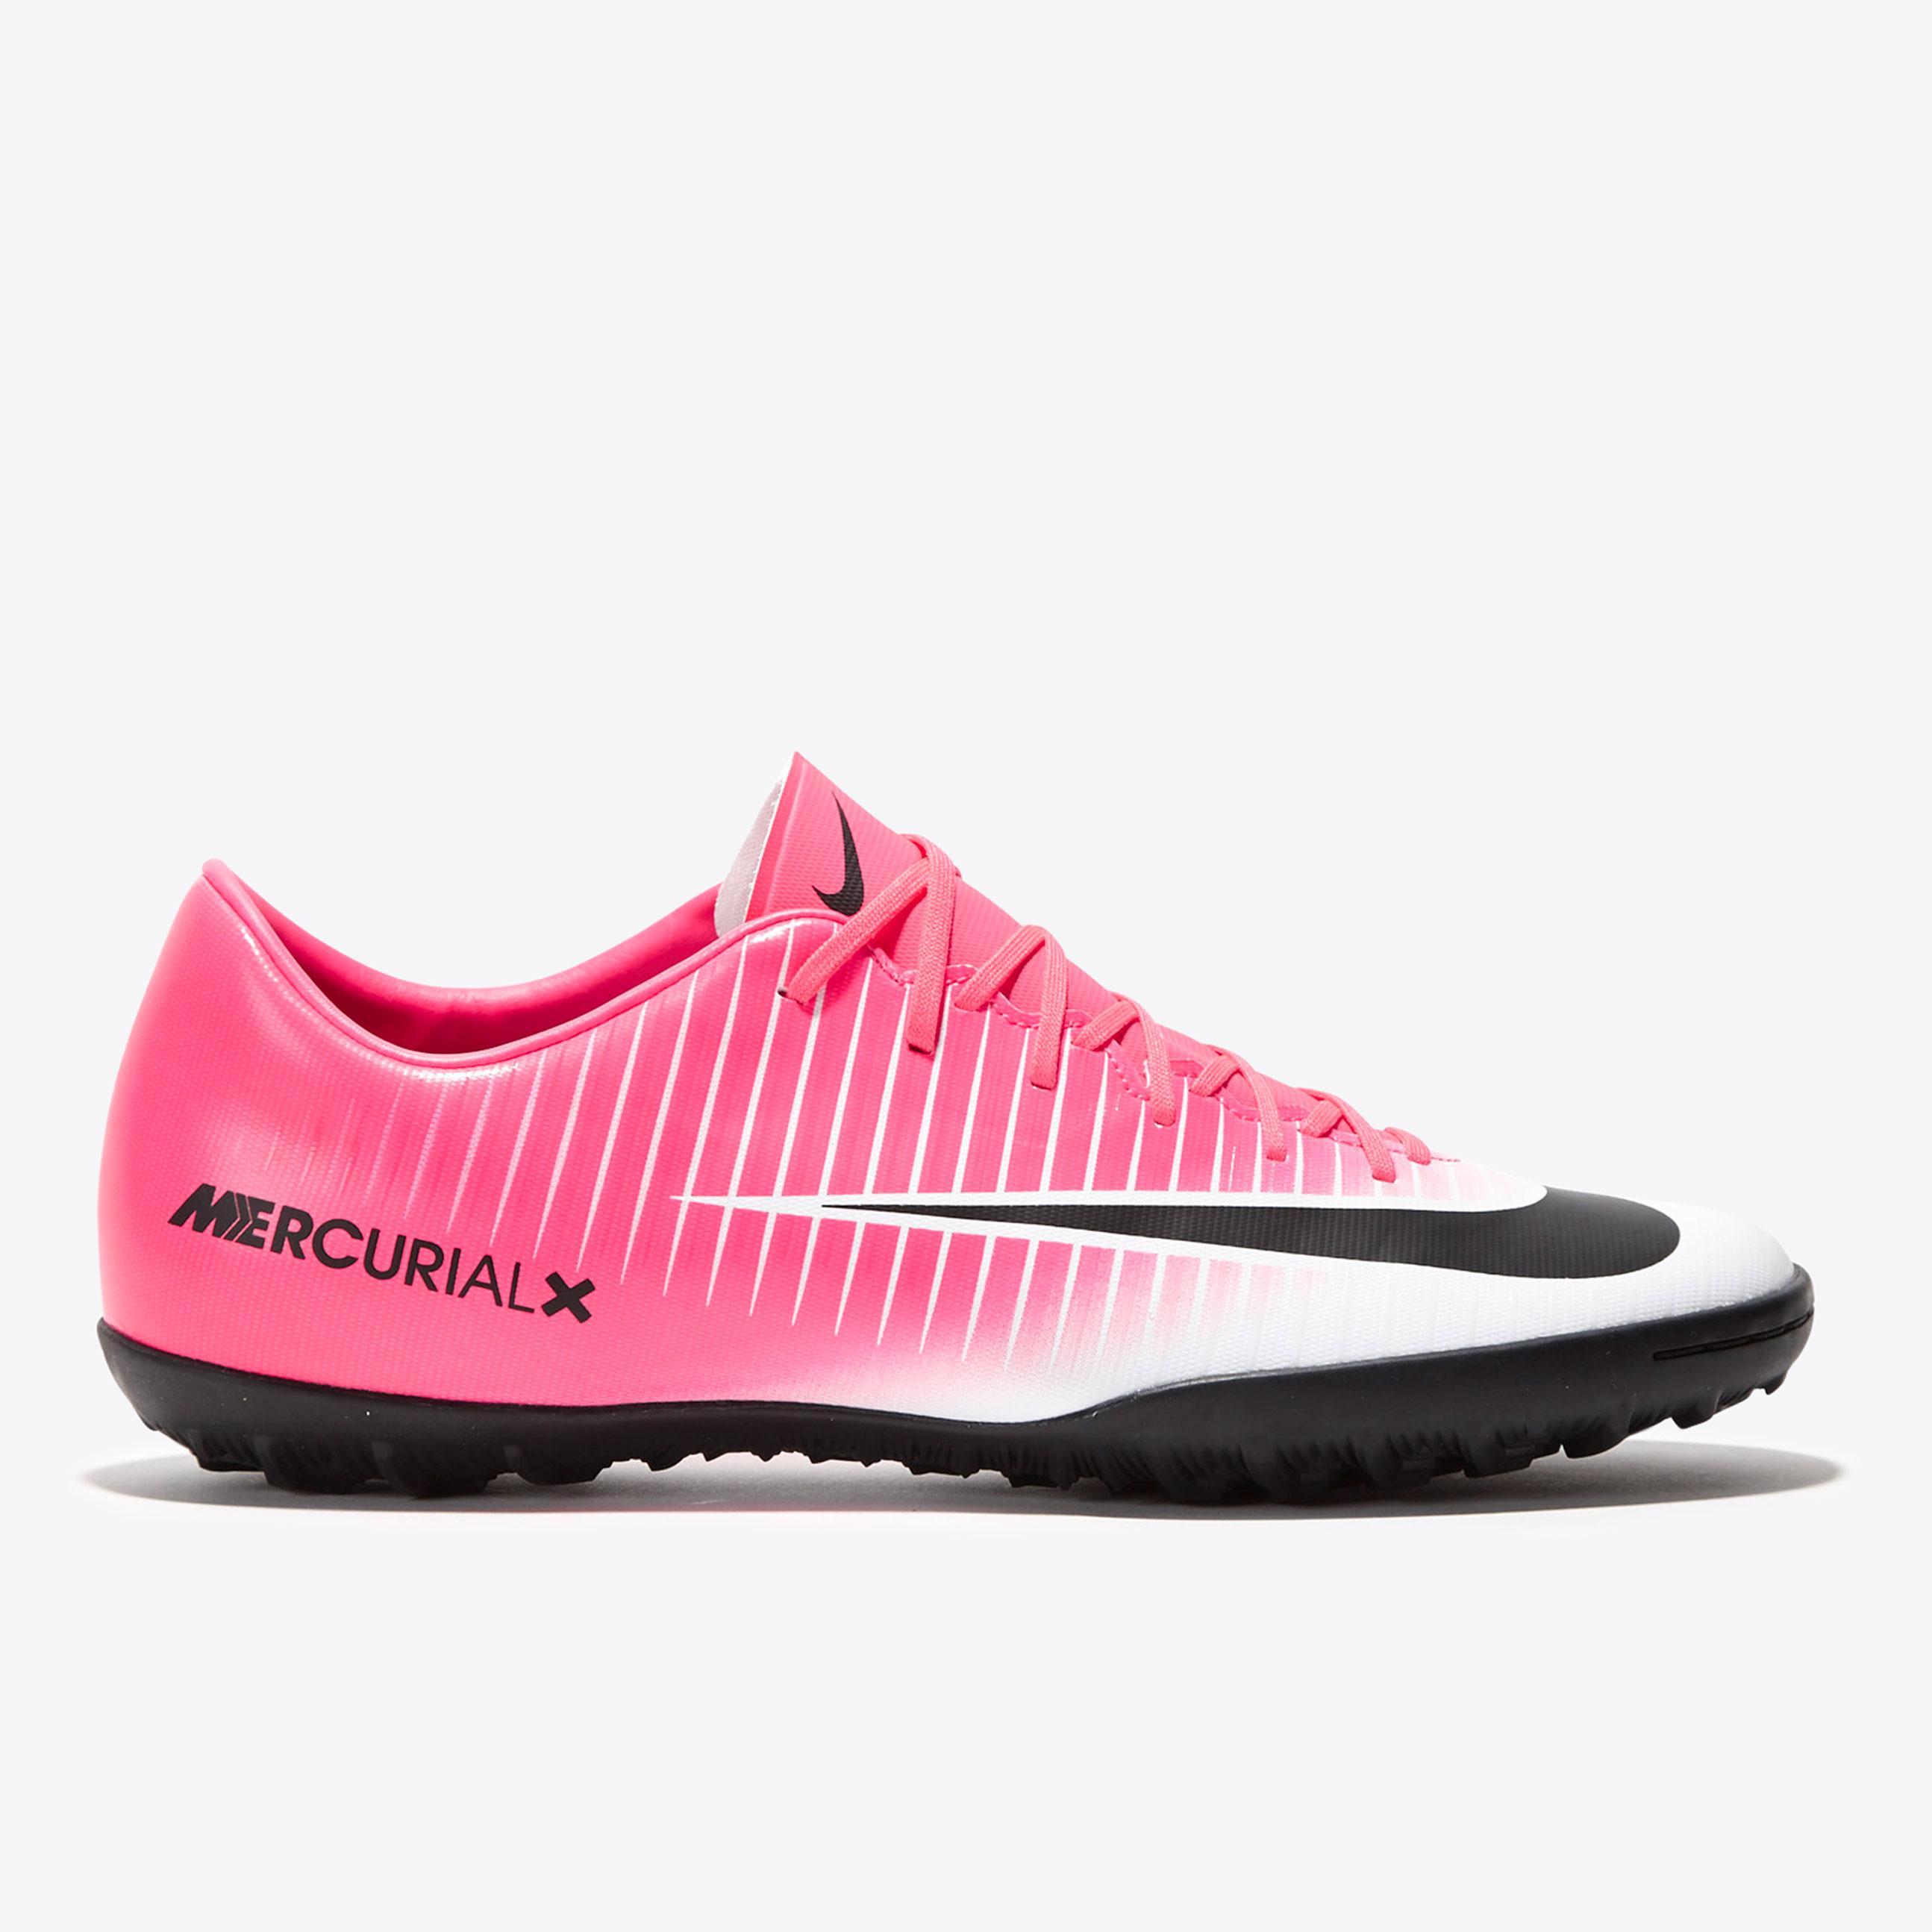 Nike Mercurial Victory VI Astroturf Trainers - Racer Pink/Black/White